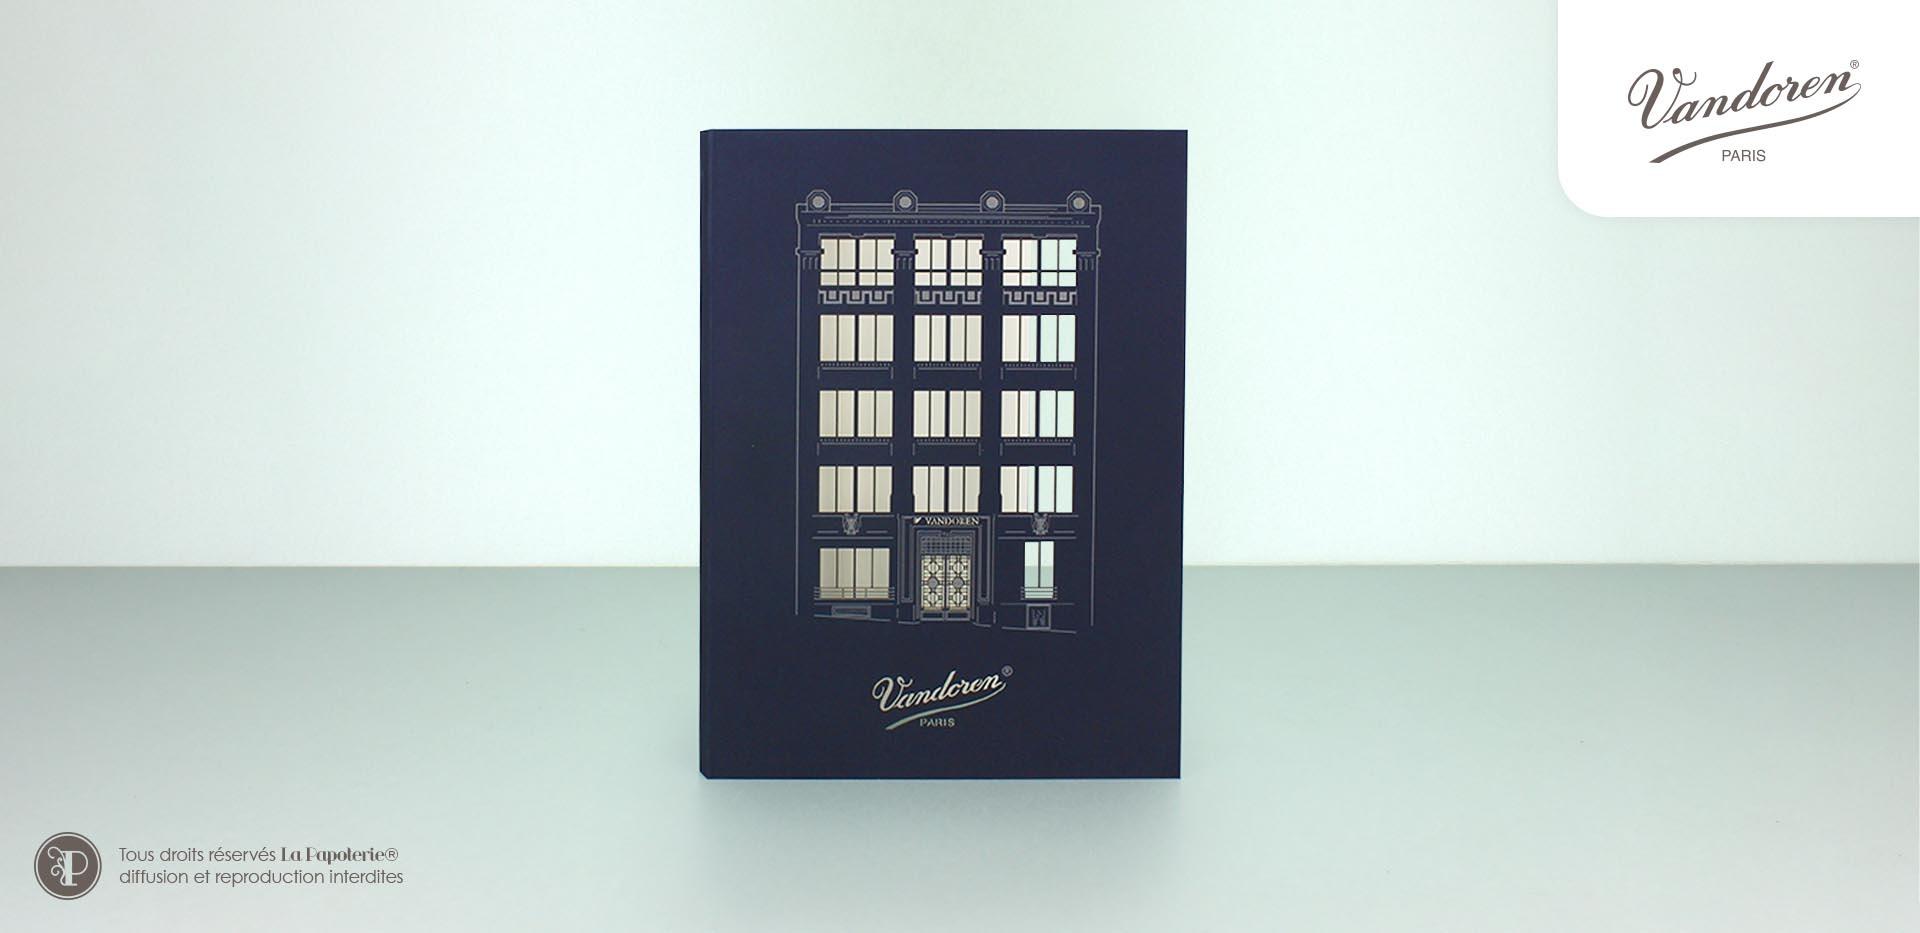 La Papoterie vandoren-a5 A5 architetural notebook Vandoren